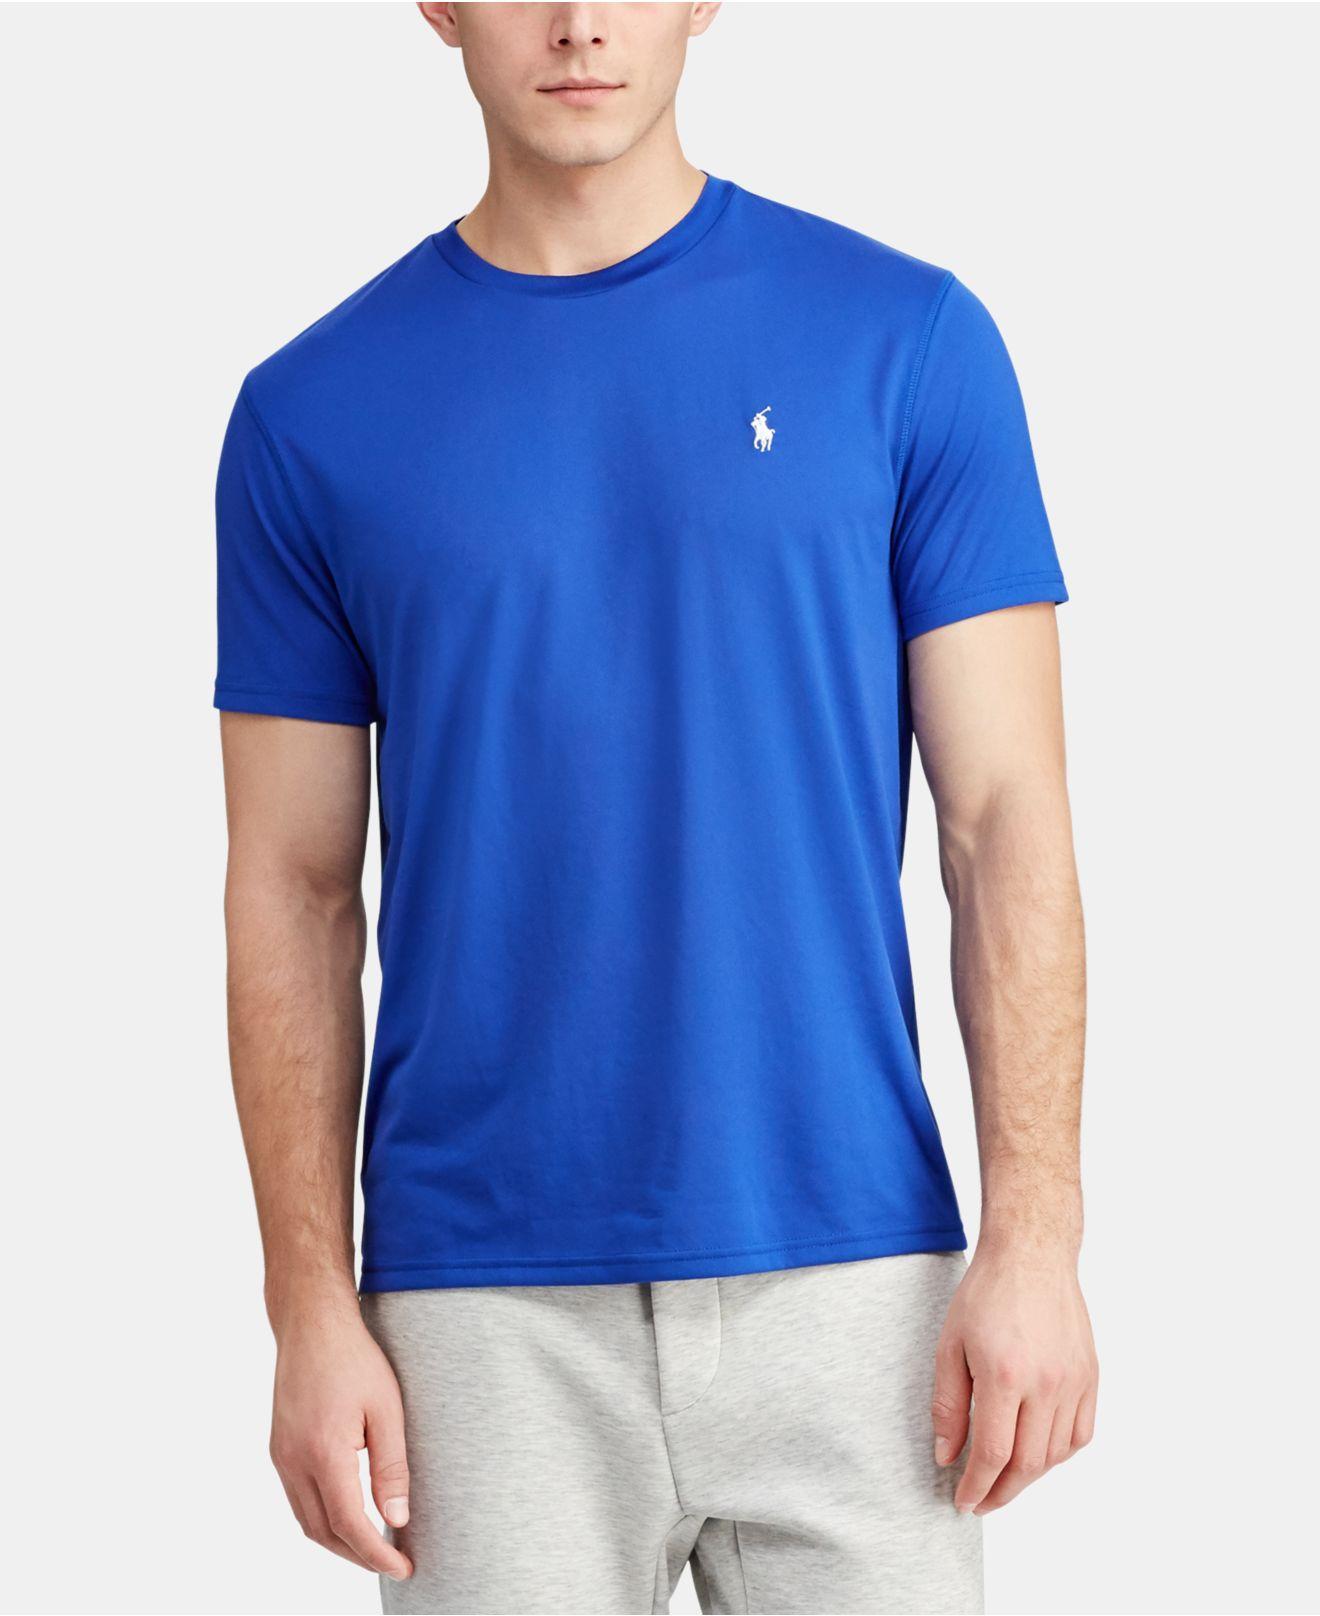 Lyst Polo Ralph Lauren Performance T Shirt In Blue For Men